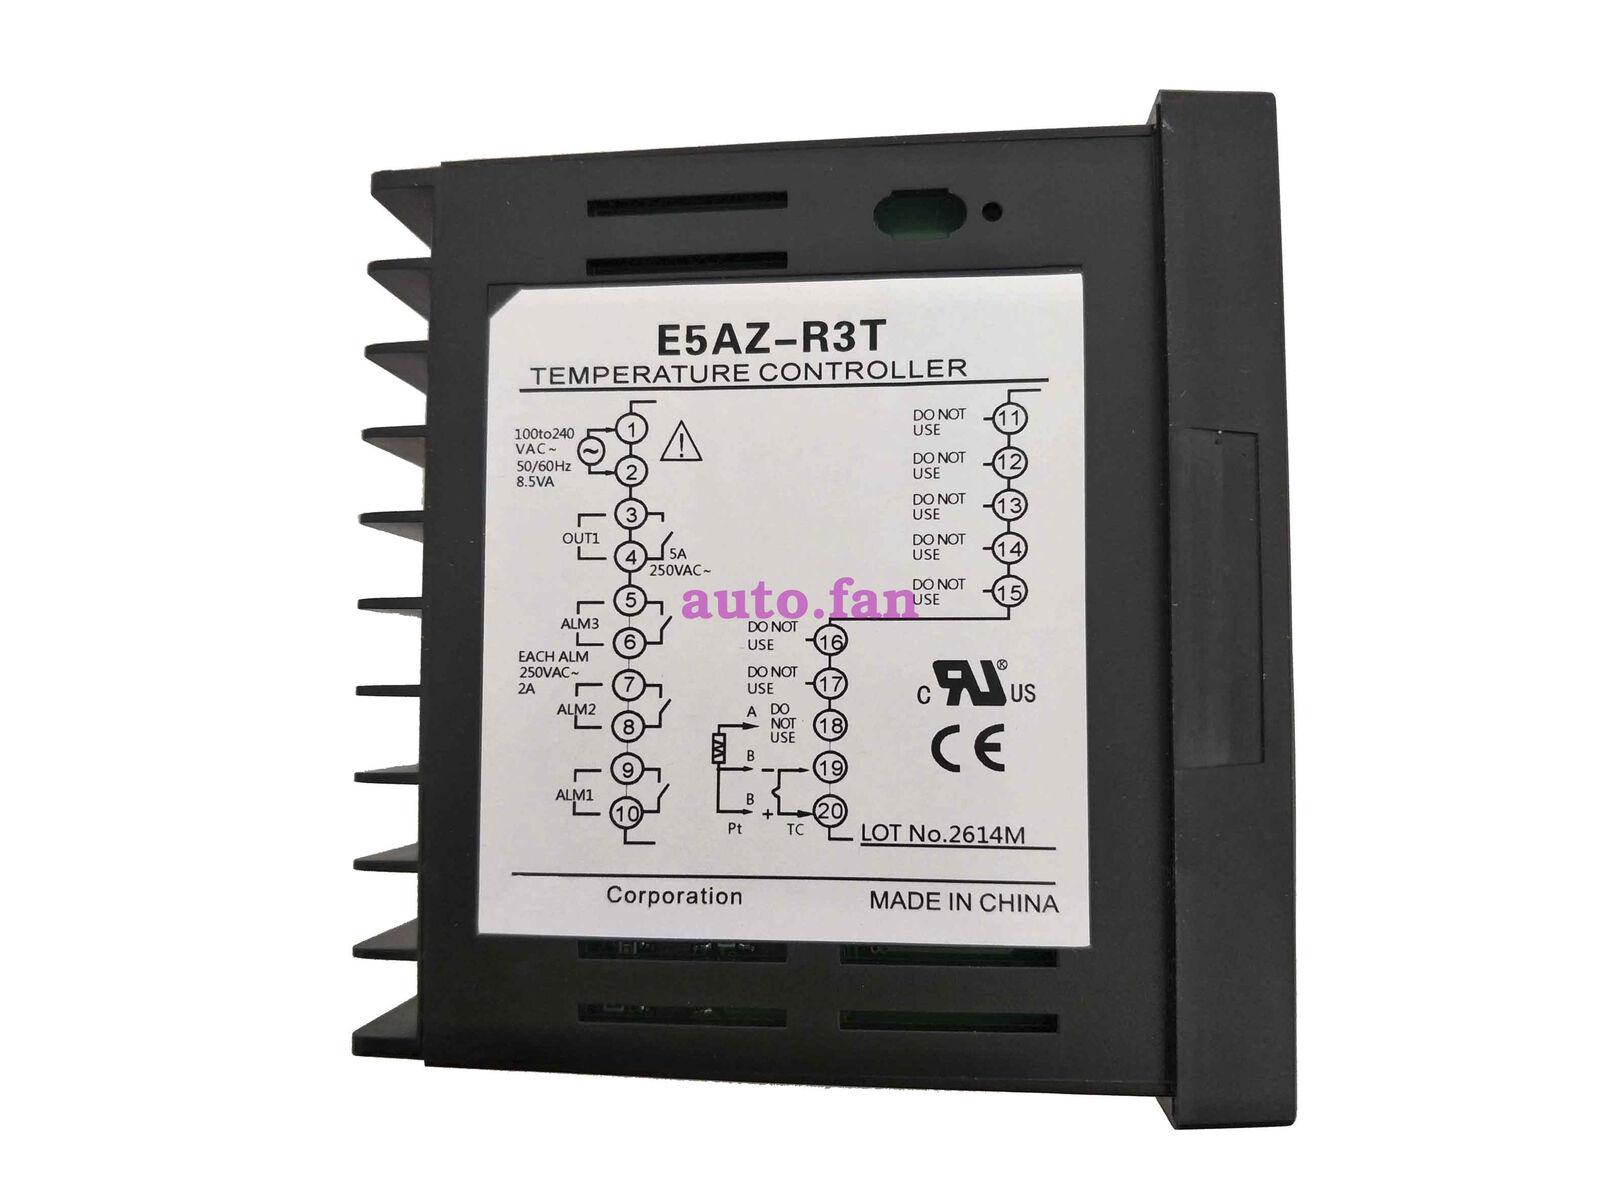 For compatible E5AZ-R3T thermostat